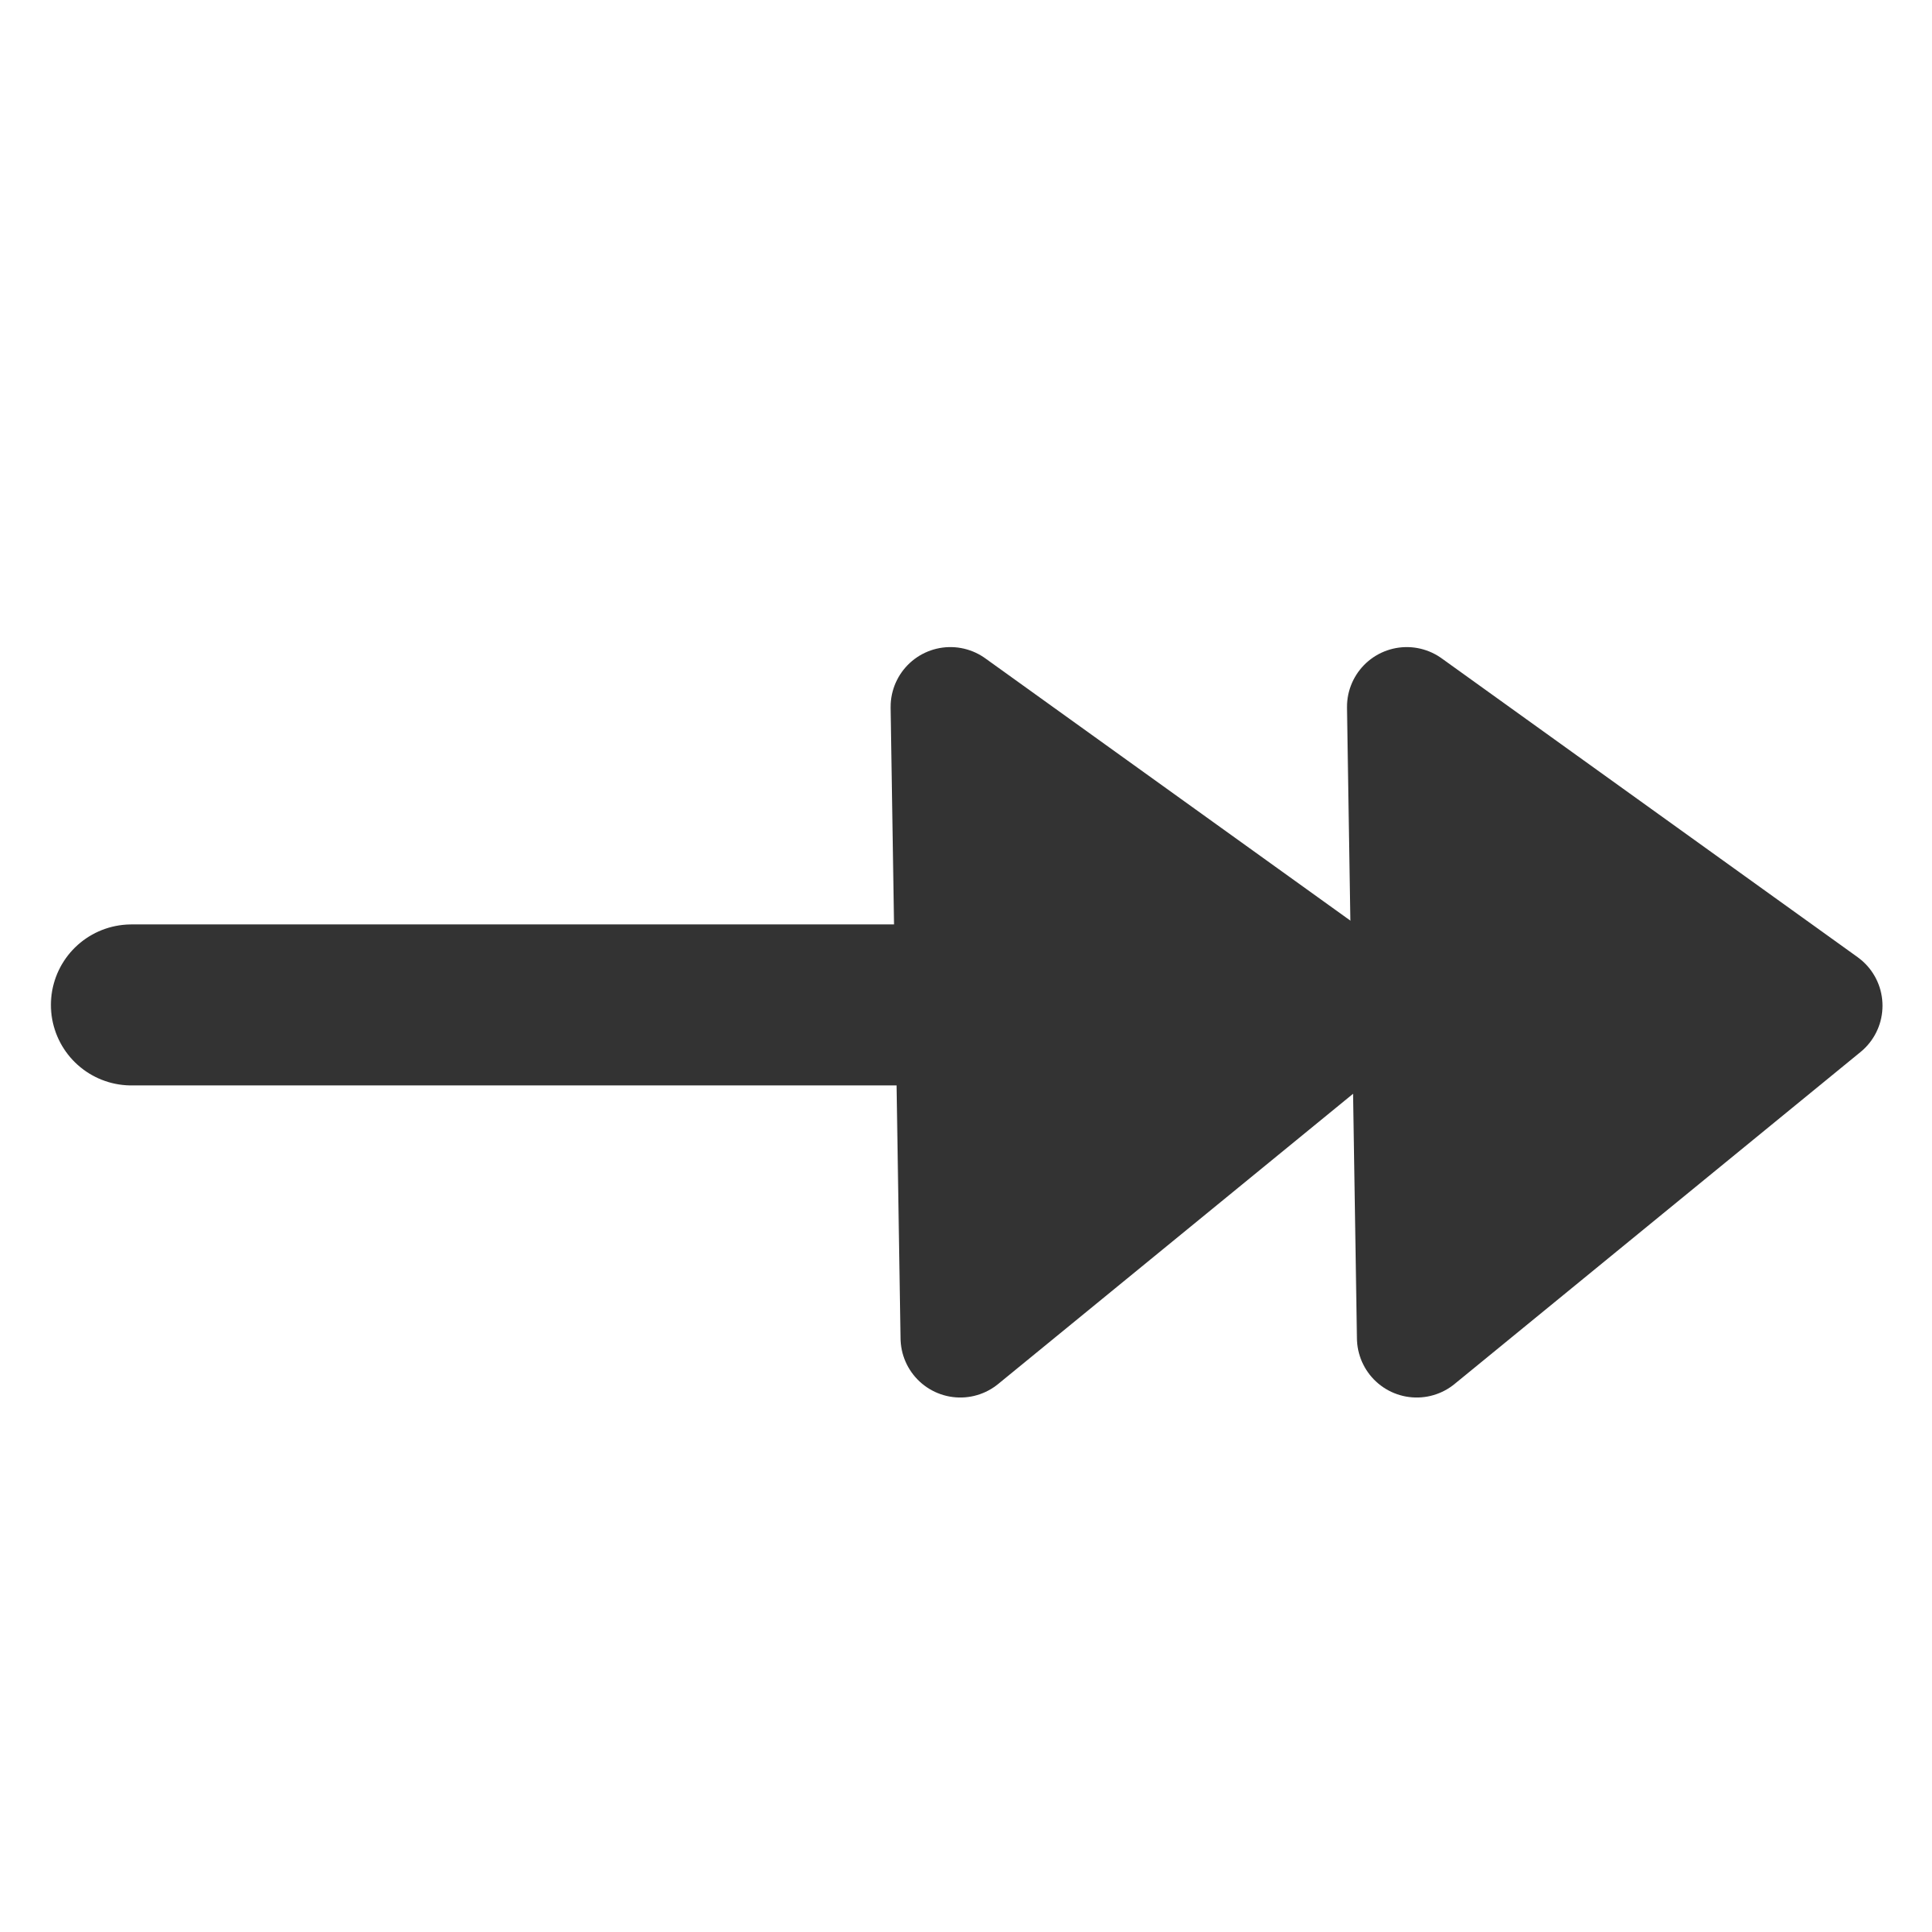 Double arrow clipart clipart free stock Clipart - ftline double arrow end clipart free stock